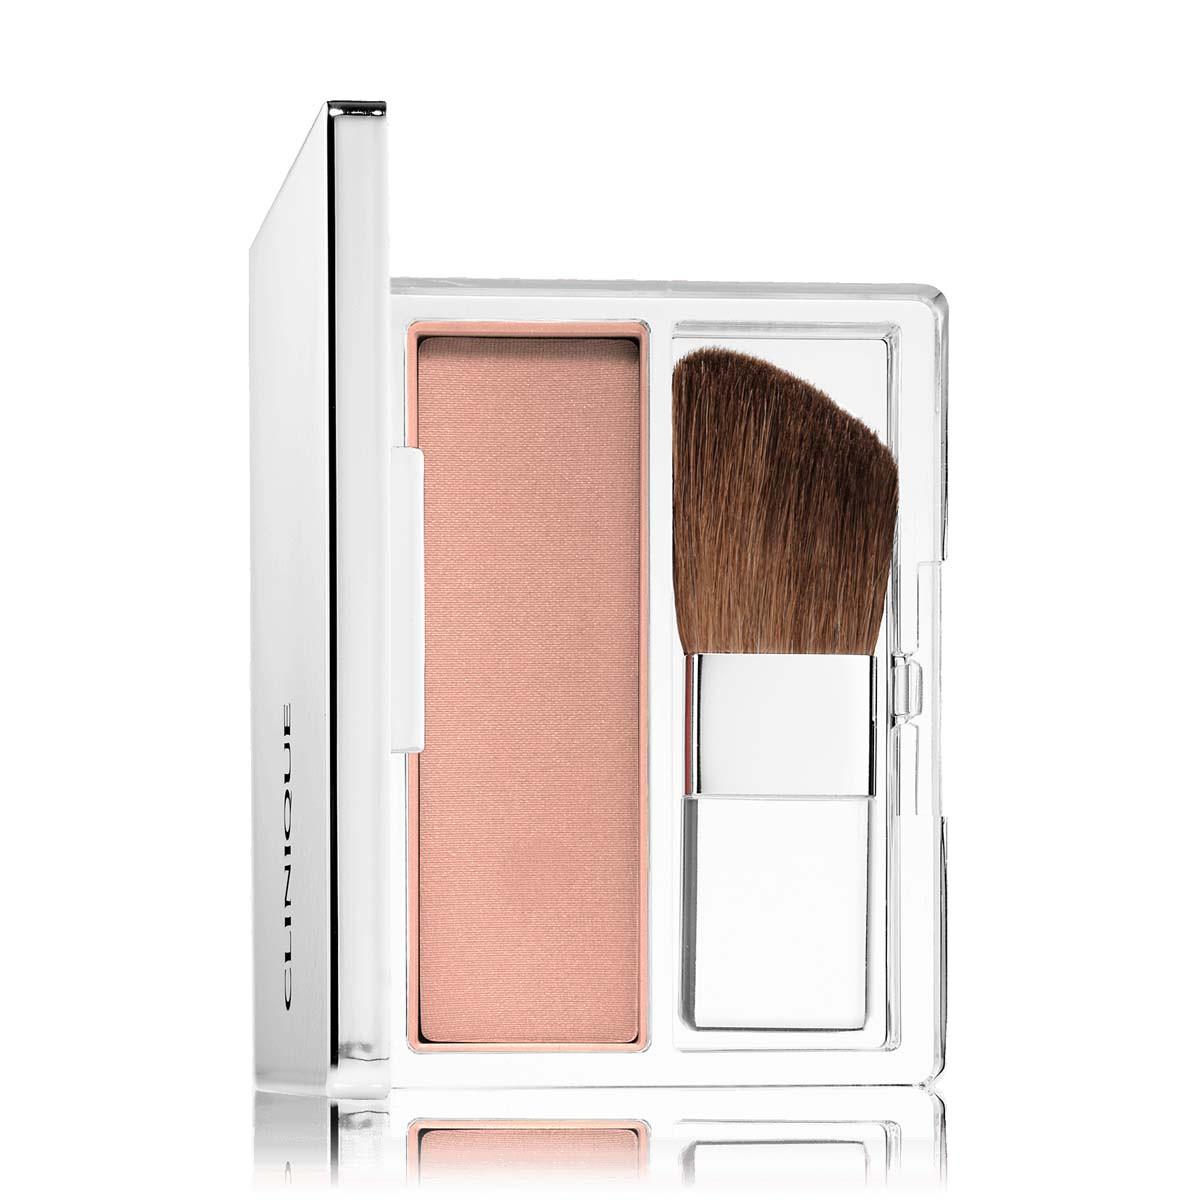 Clinique blushing blush - 101 aglow, 101 AGLOW, large image number 0